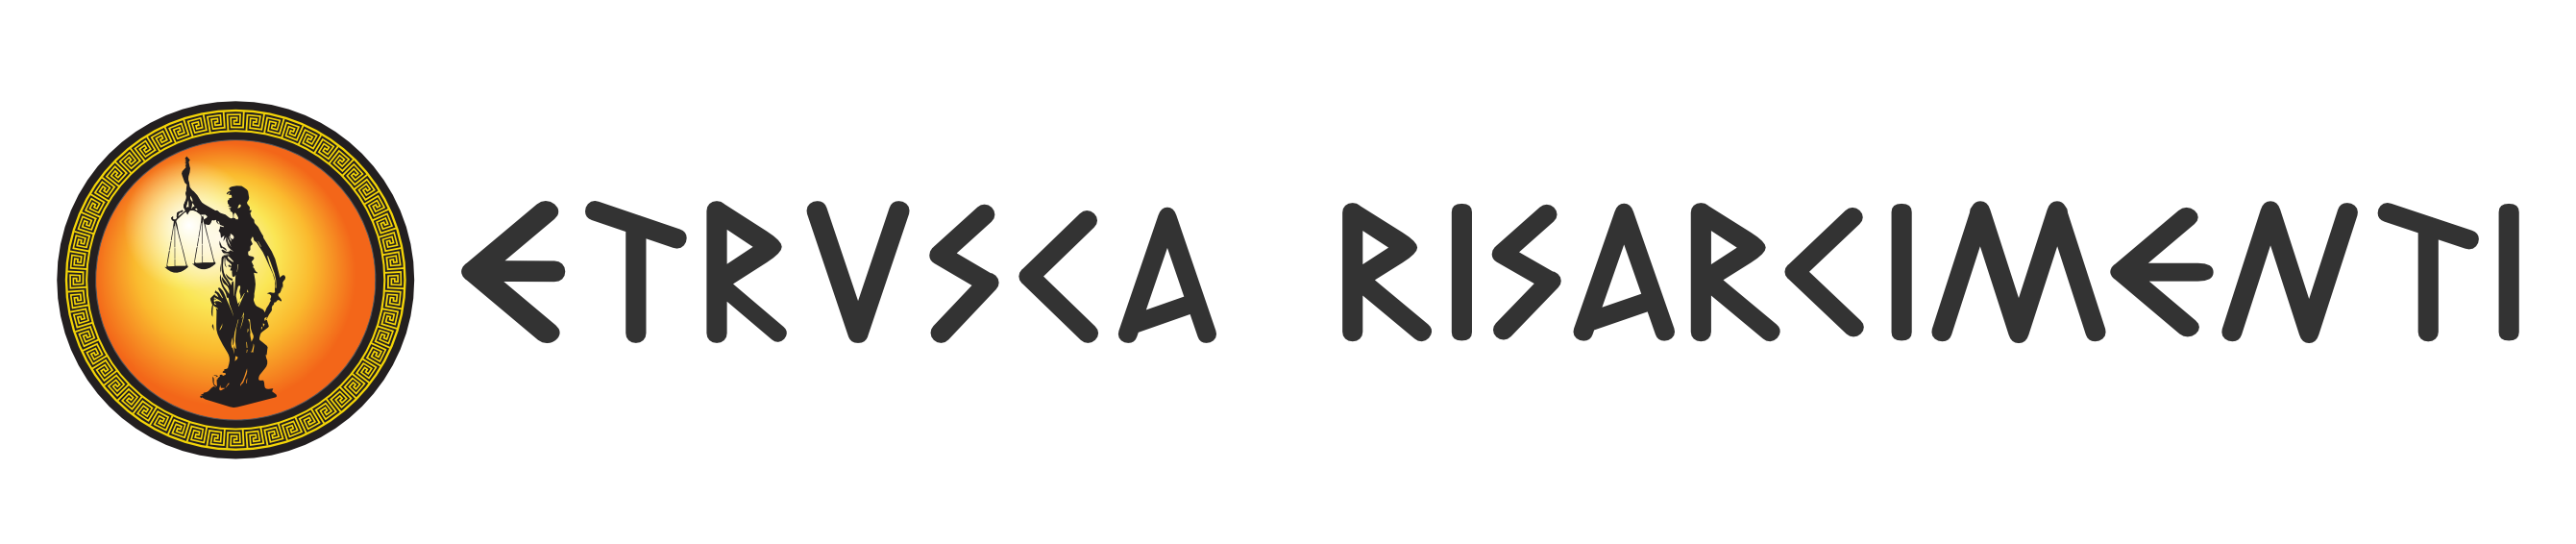 Etrusca Risarcimenti